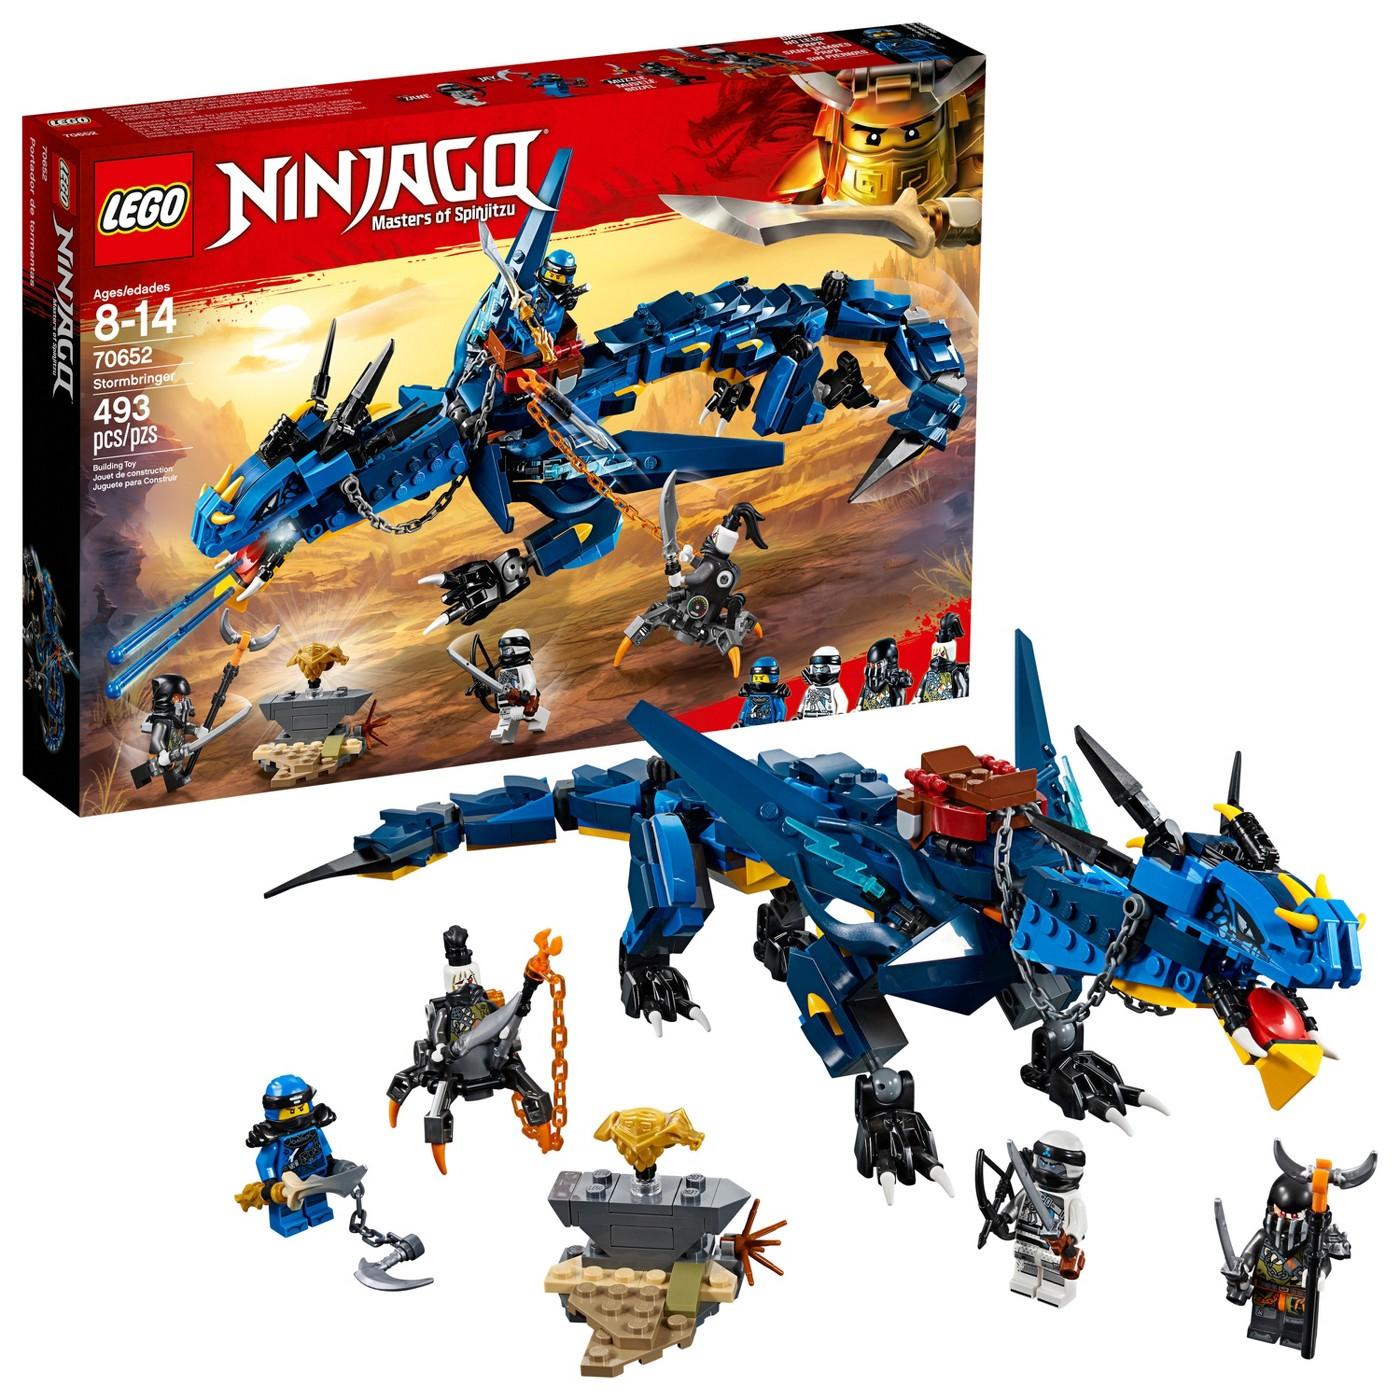 LEGO Ninjago Stormbringer 70652 - image 1 of 6